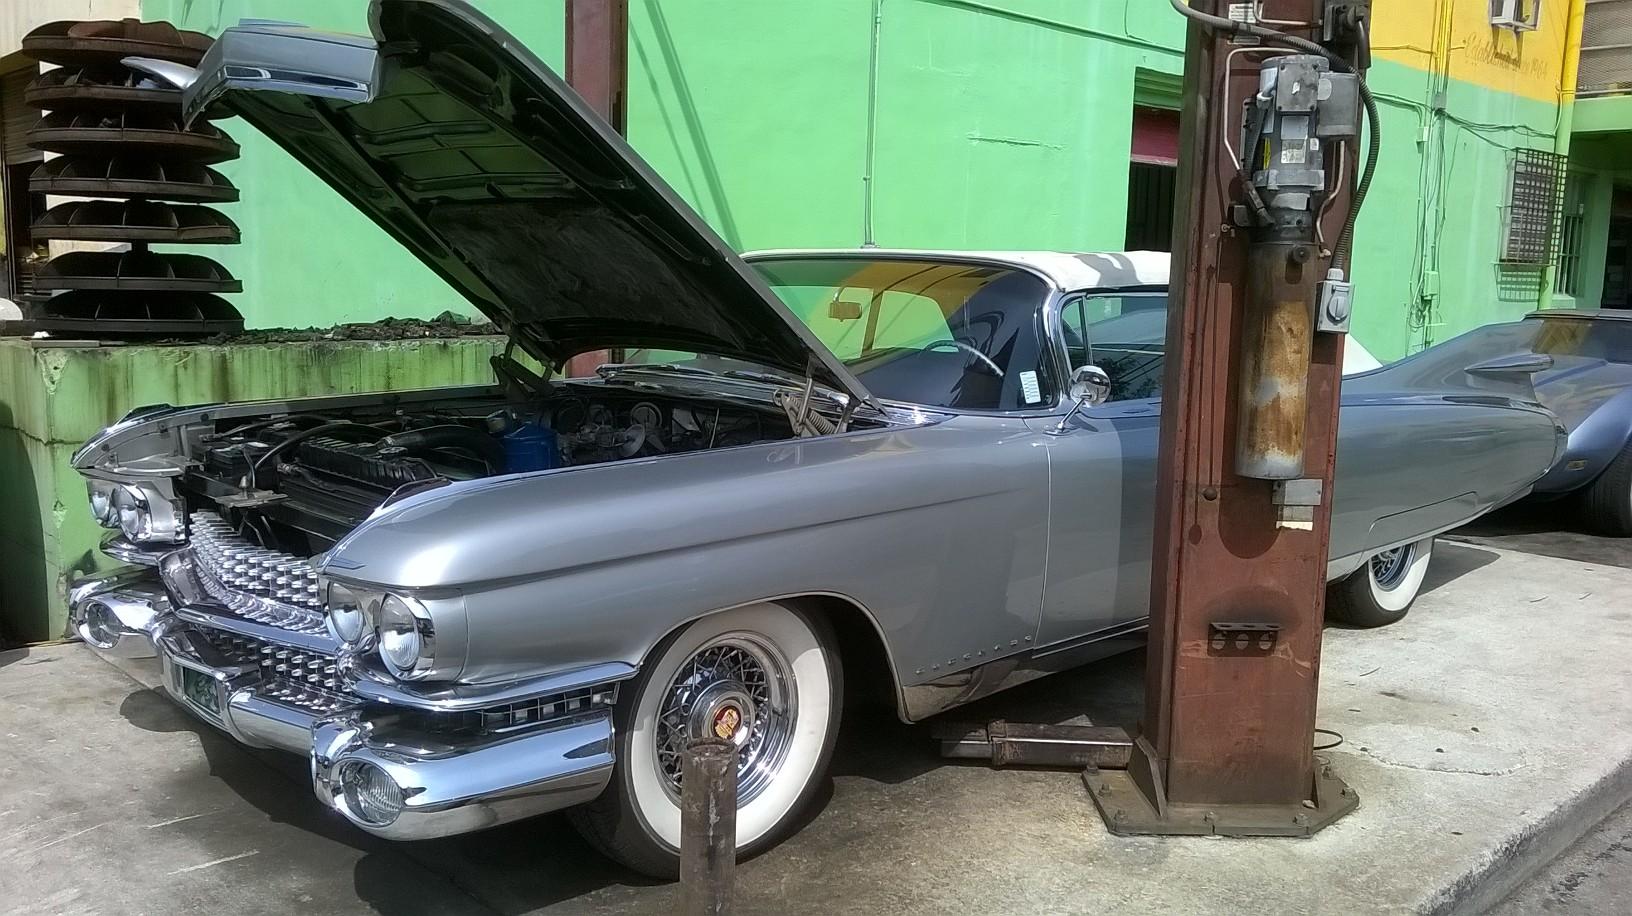 1959 El Dorado_w a Rochester tri-power